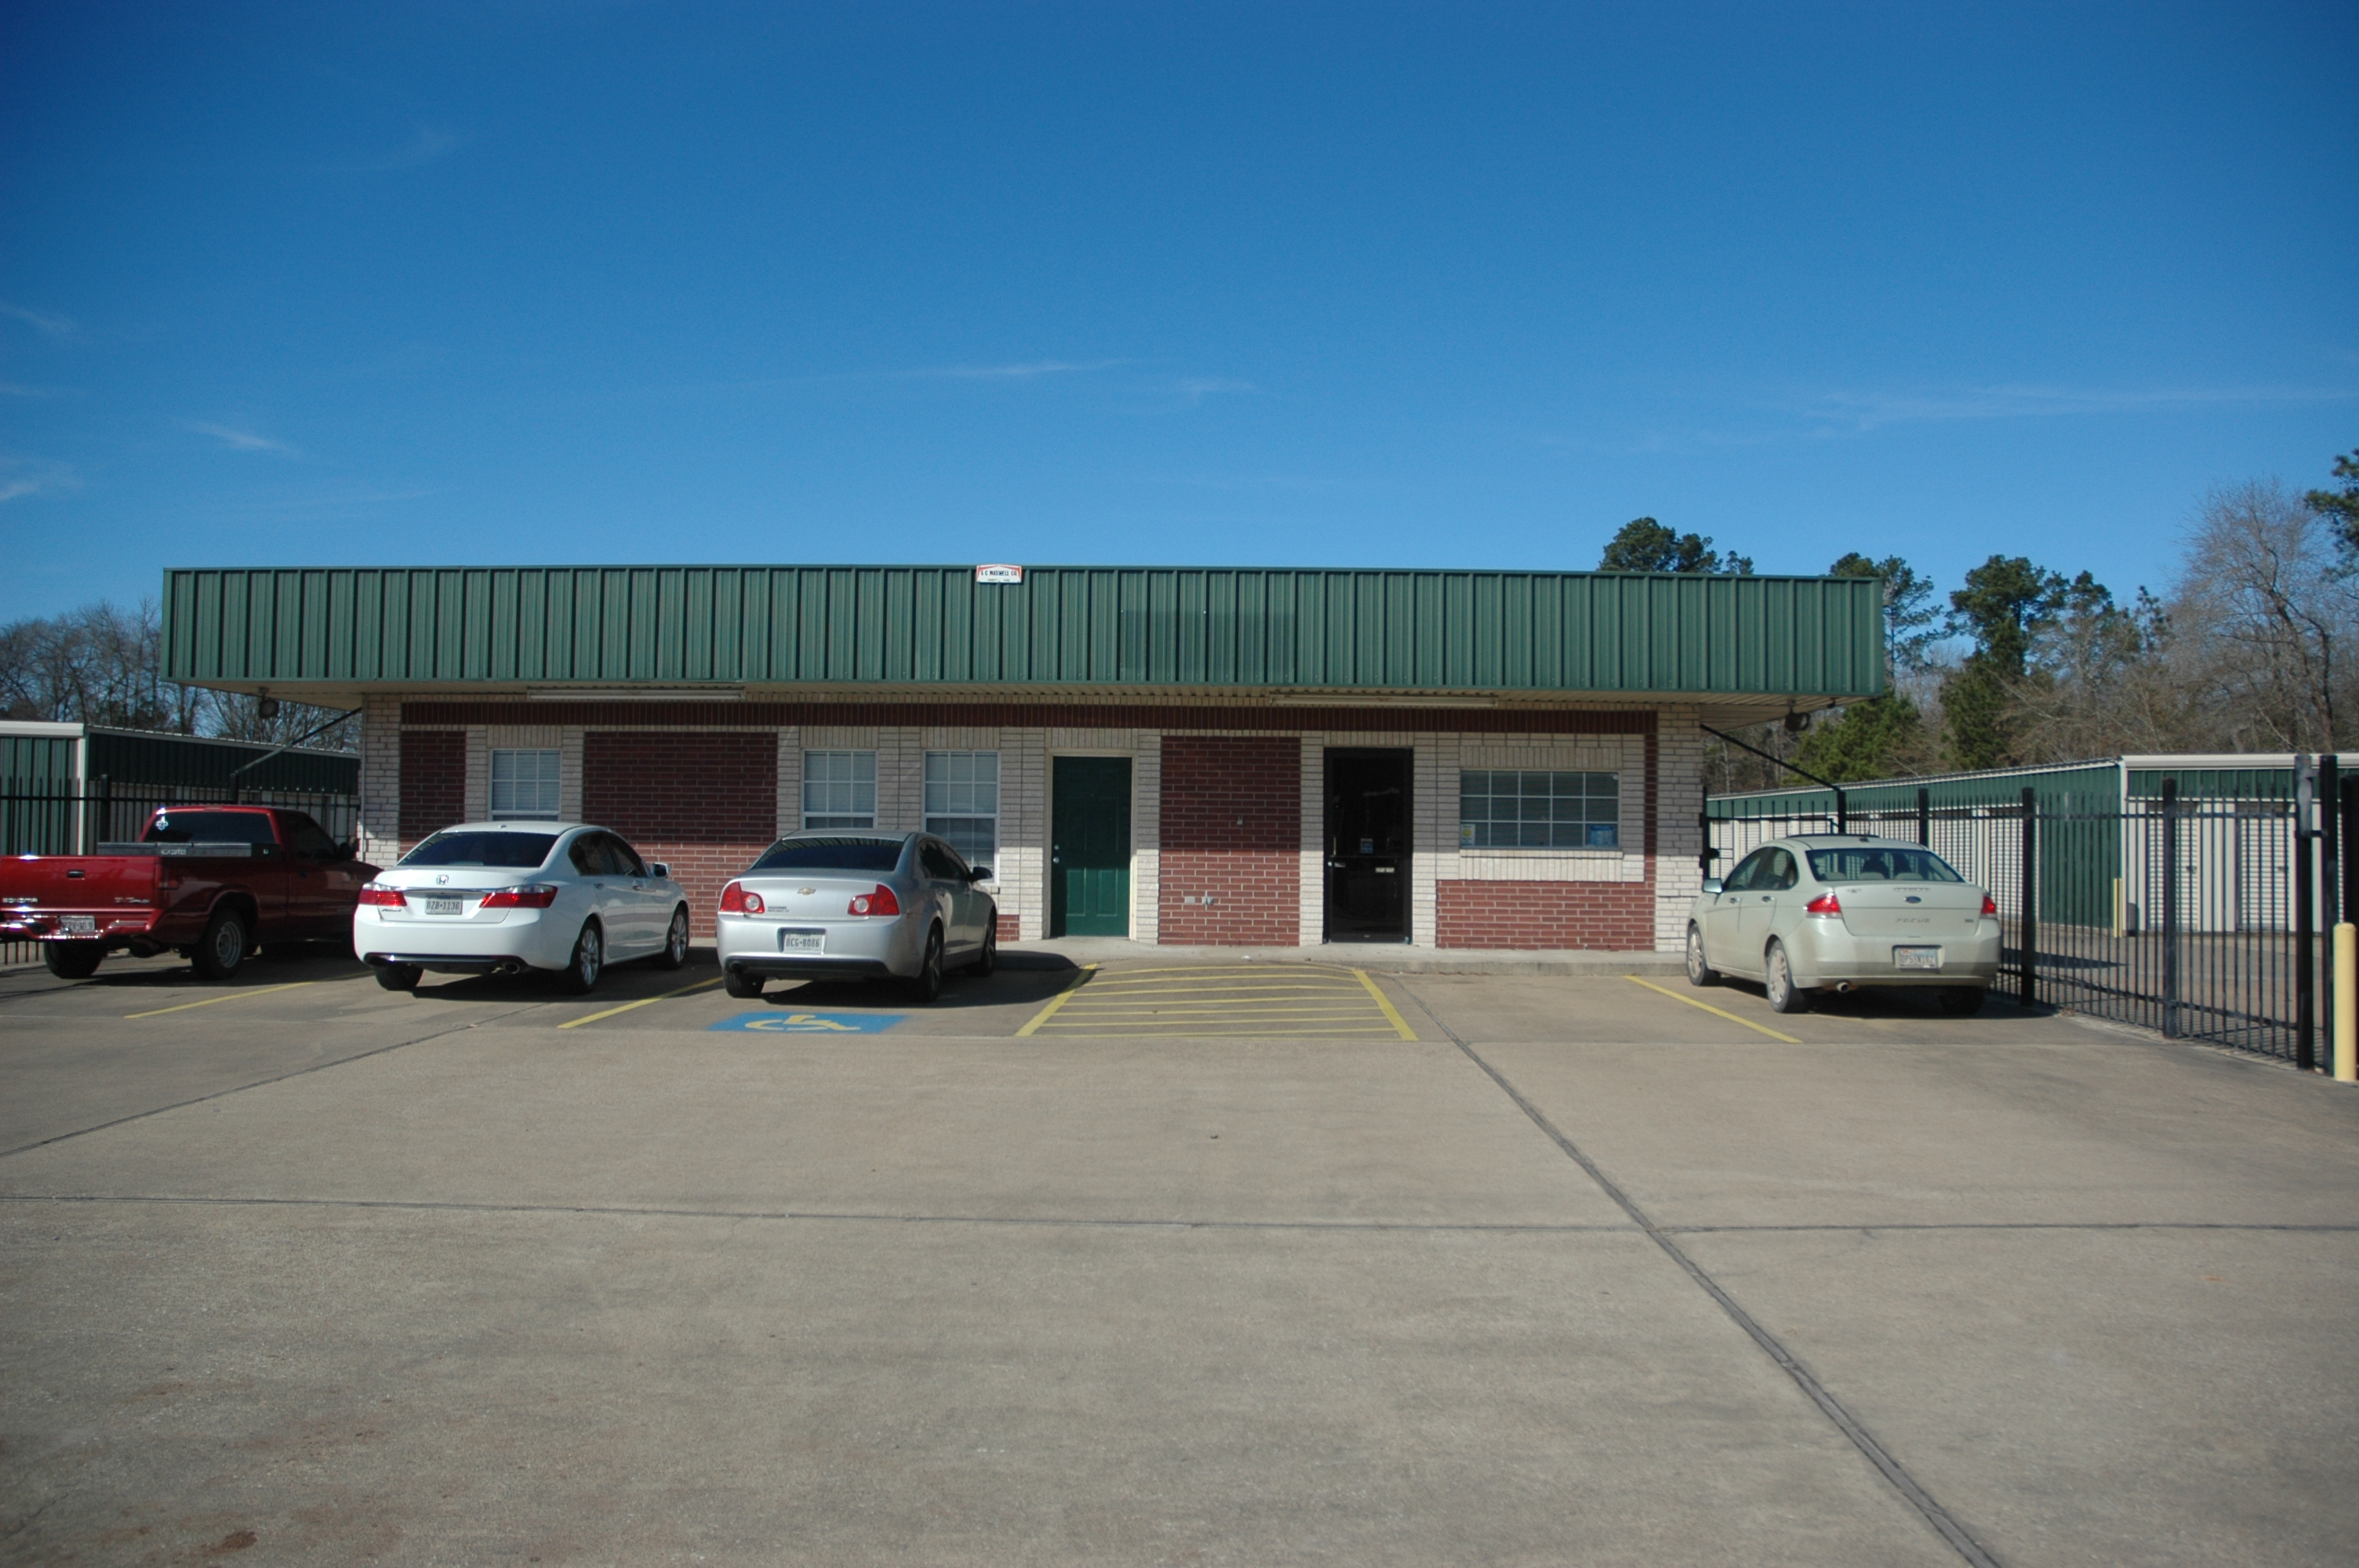 AAA Self Storage in Diboll, Texas